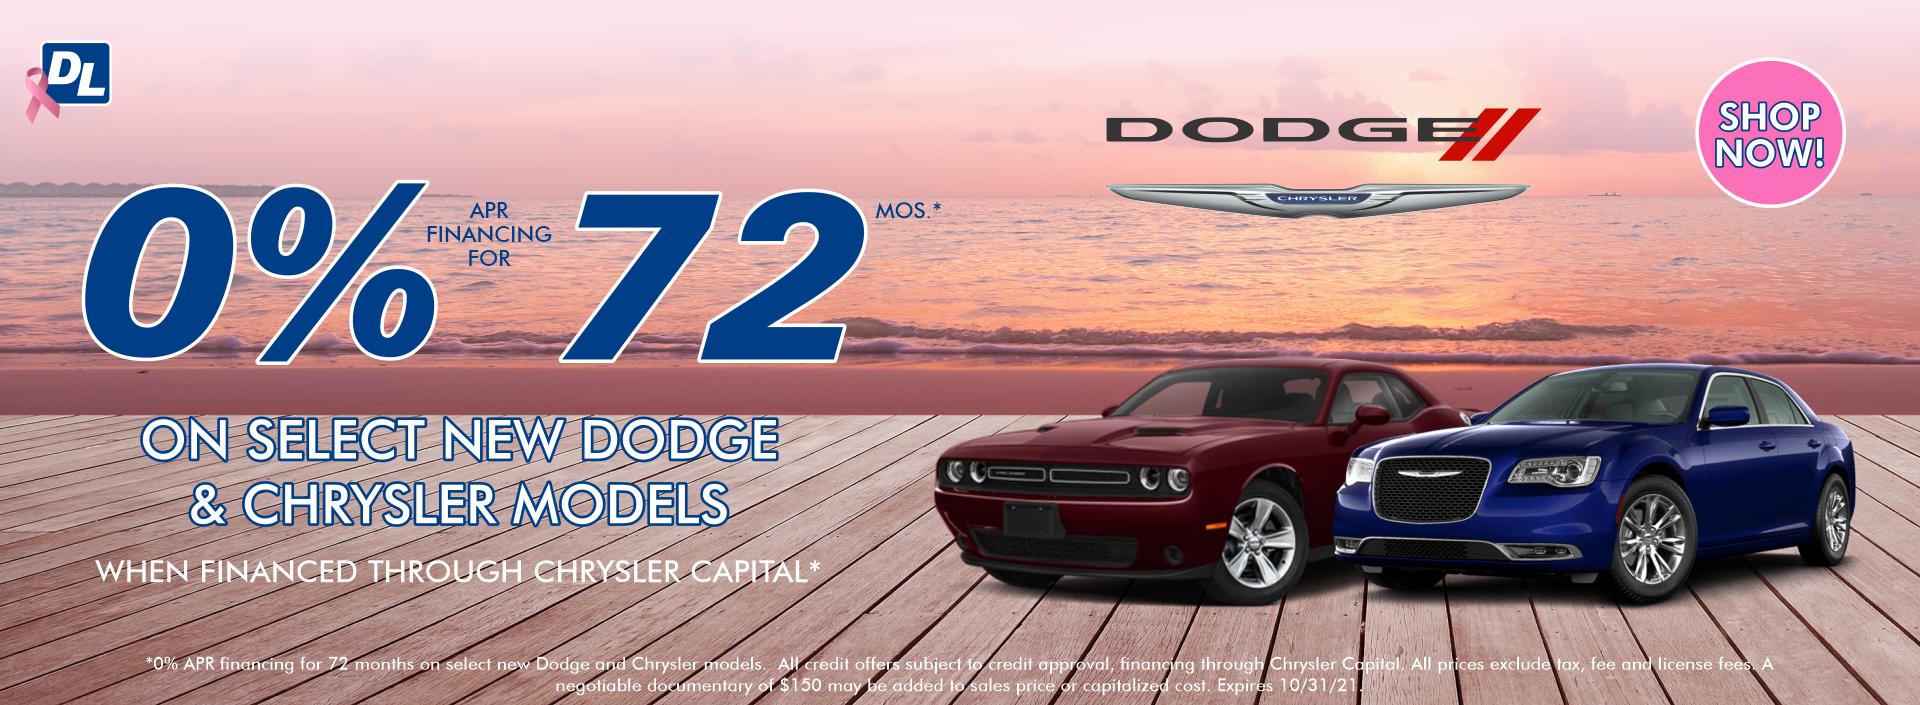 CDJR-webtiles Dodge